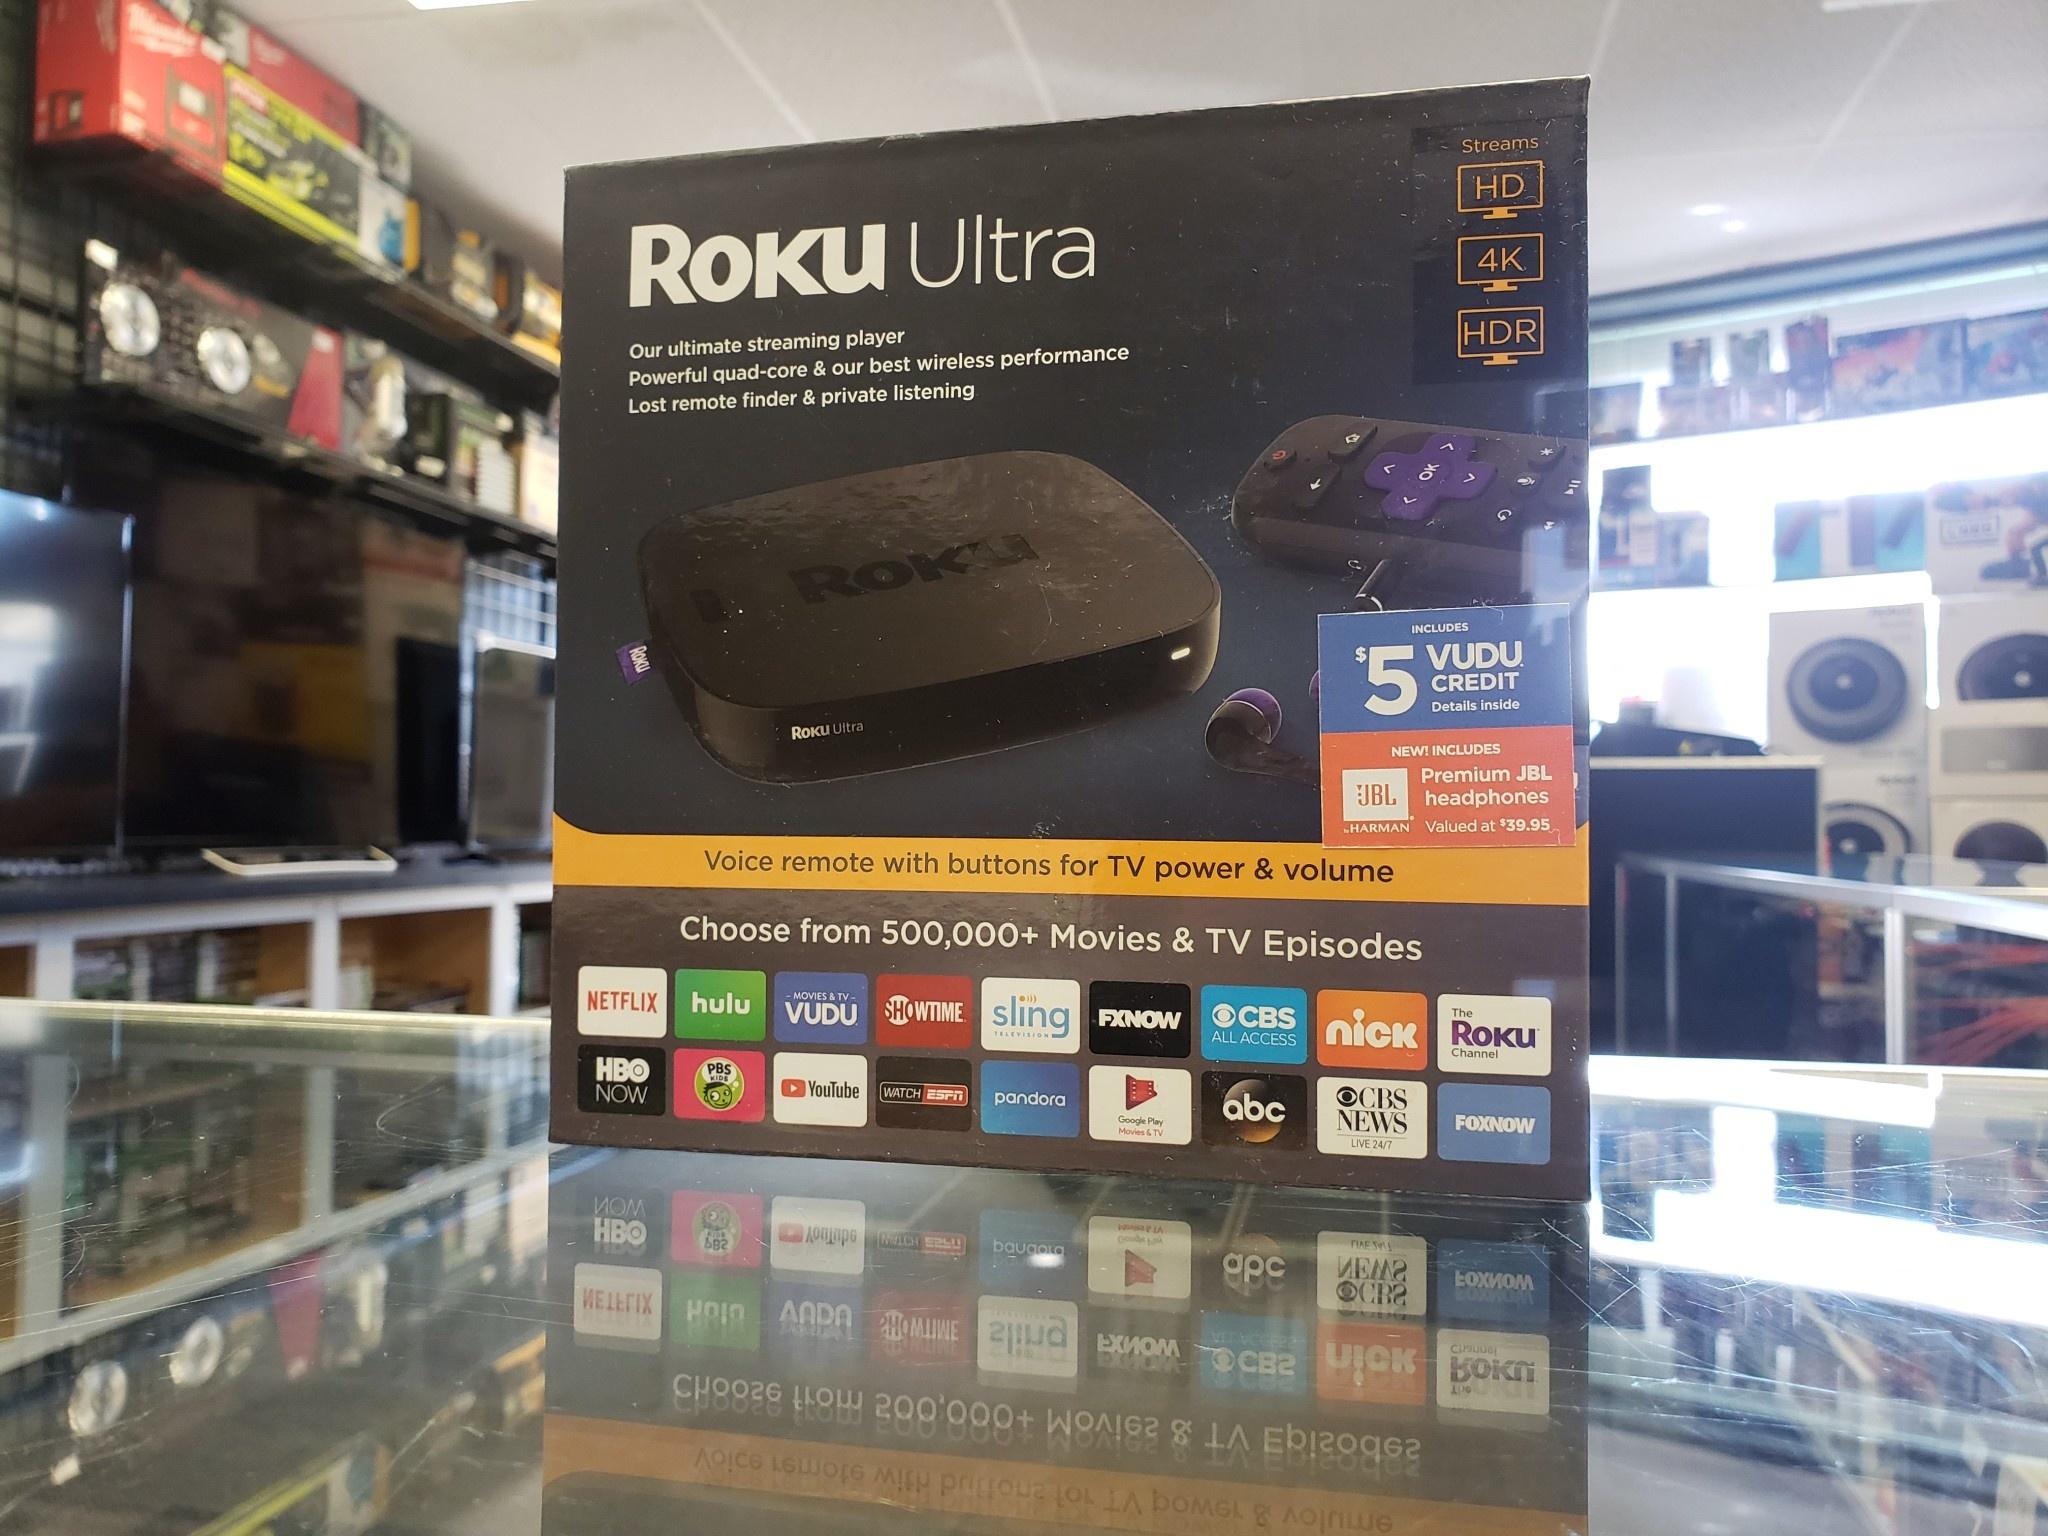 New - Roku Ultra 4K Streaming Player